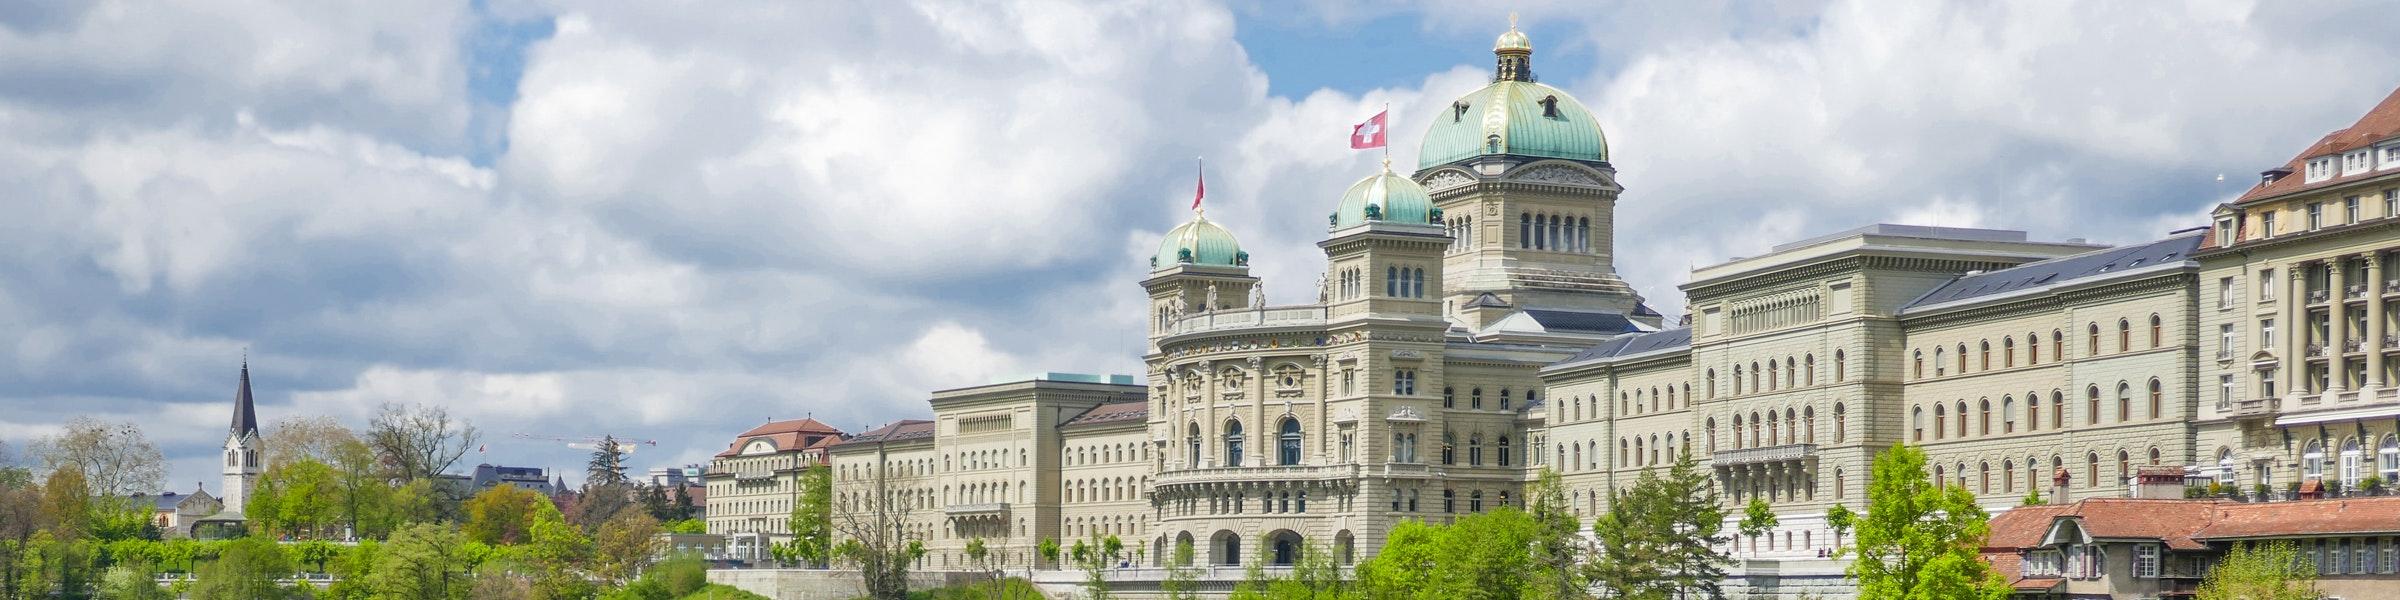 Federal Palace Bern